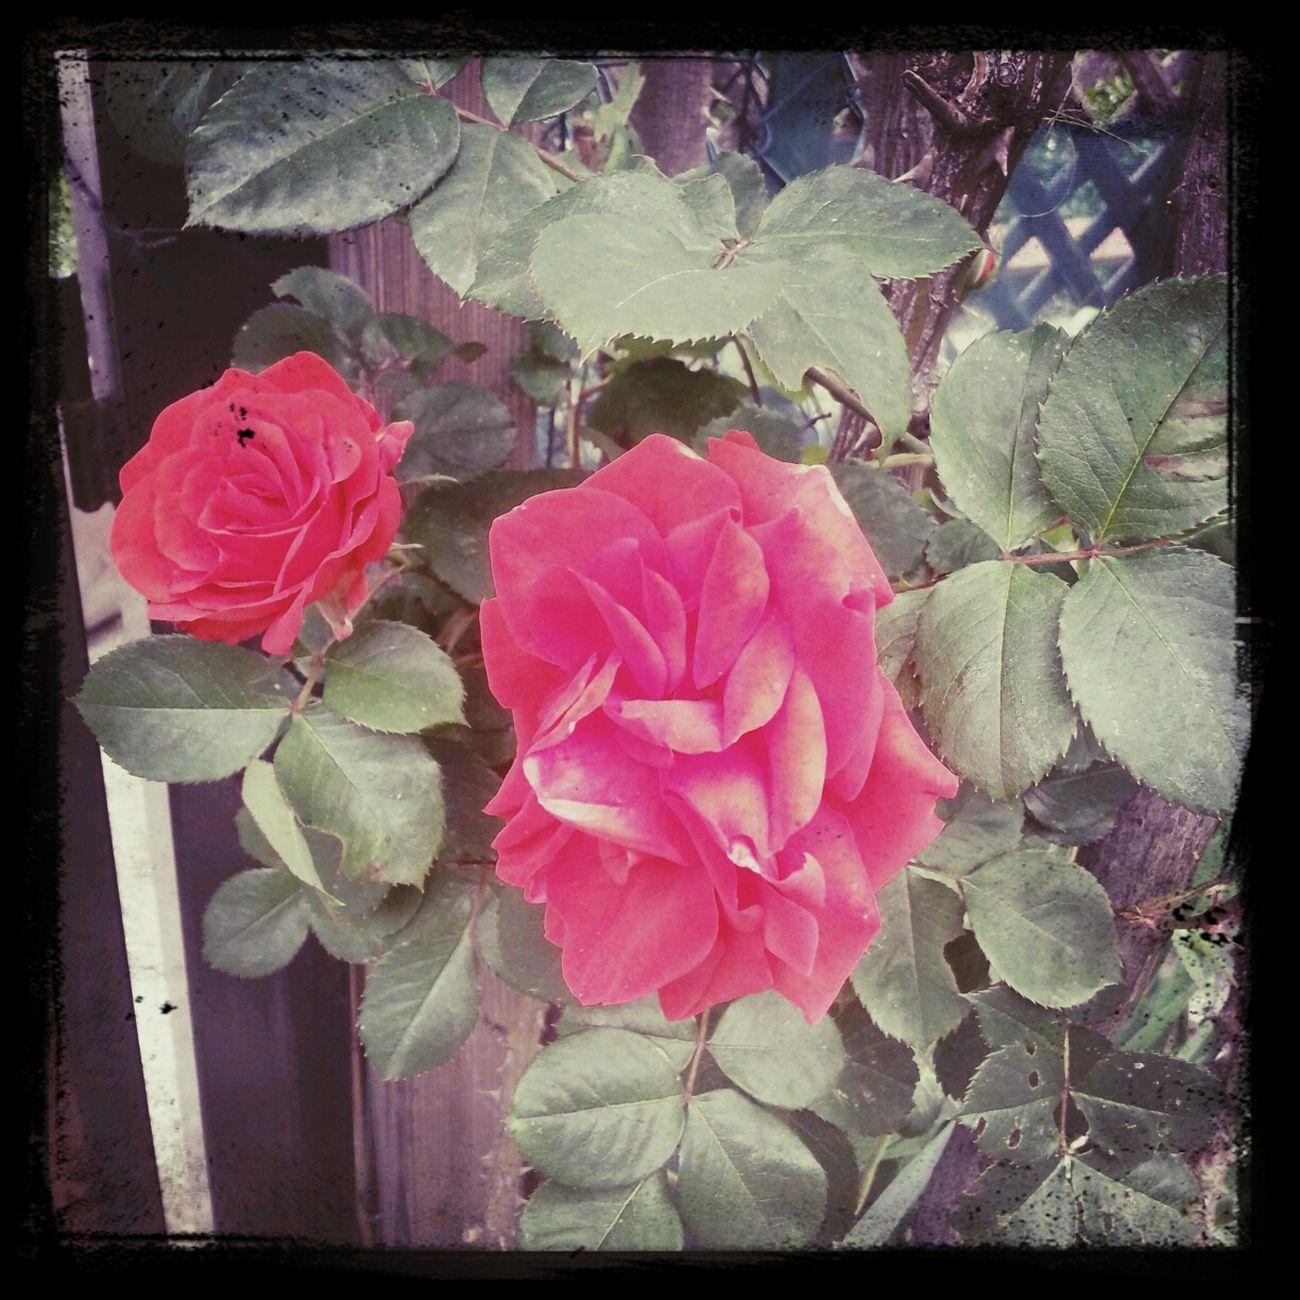 Festadellamamma Red Rose Flowers,Plants & Garden